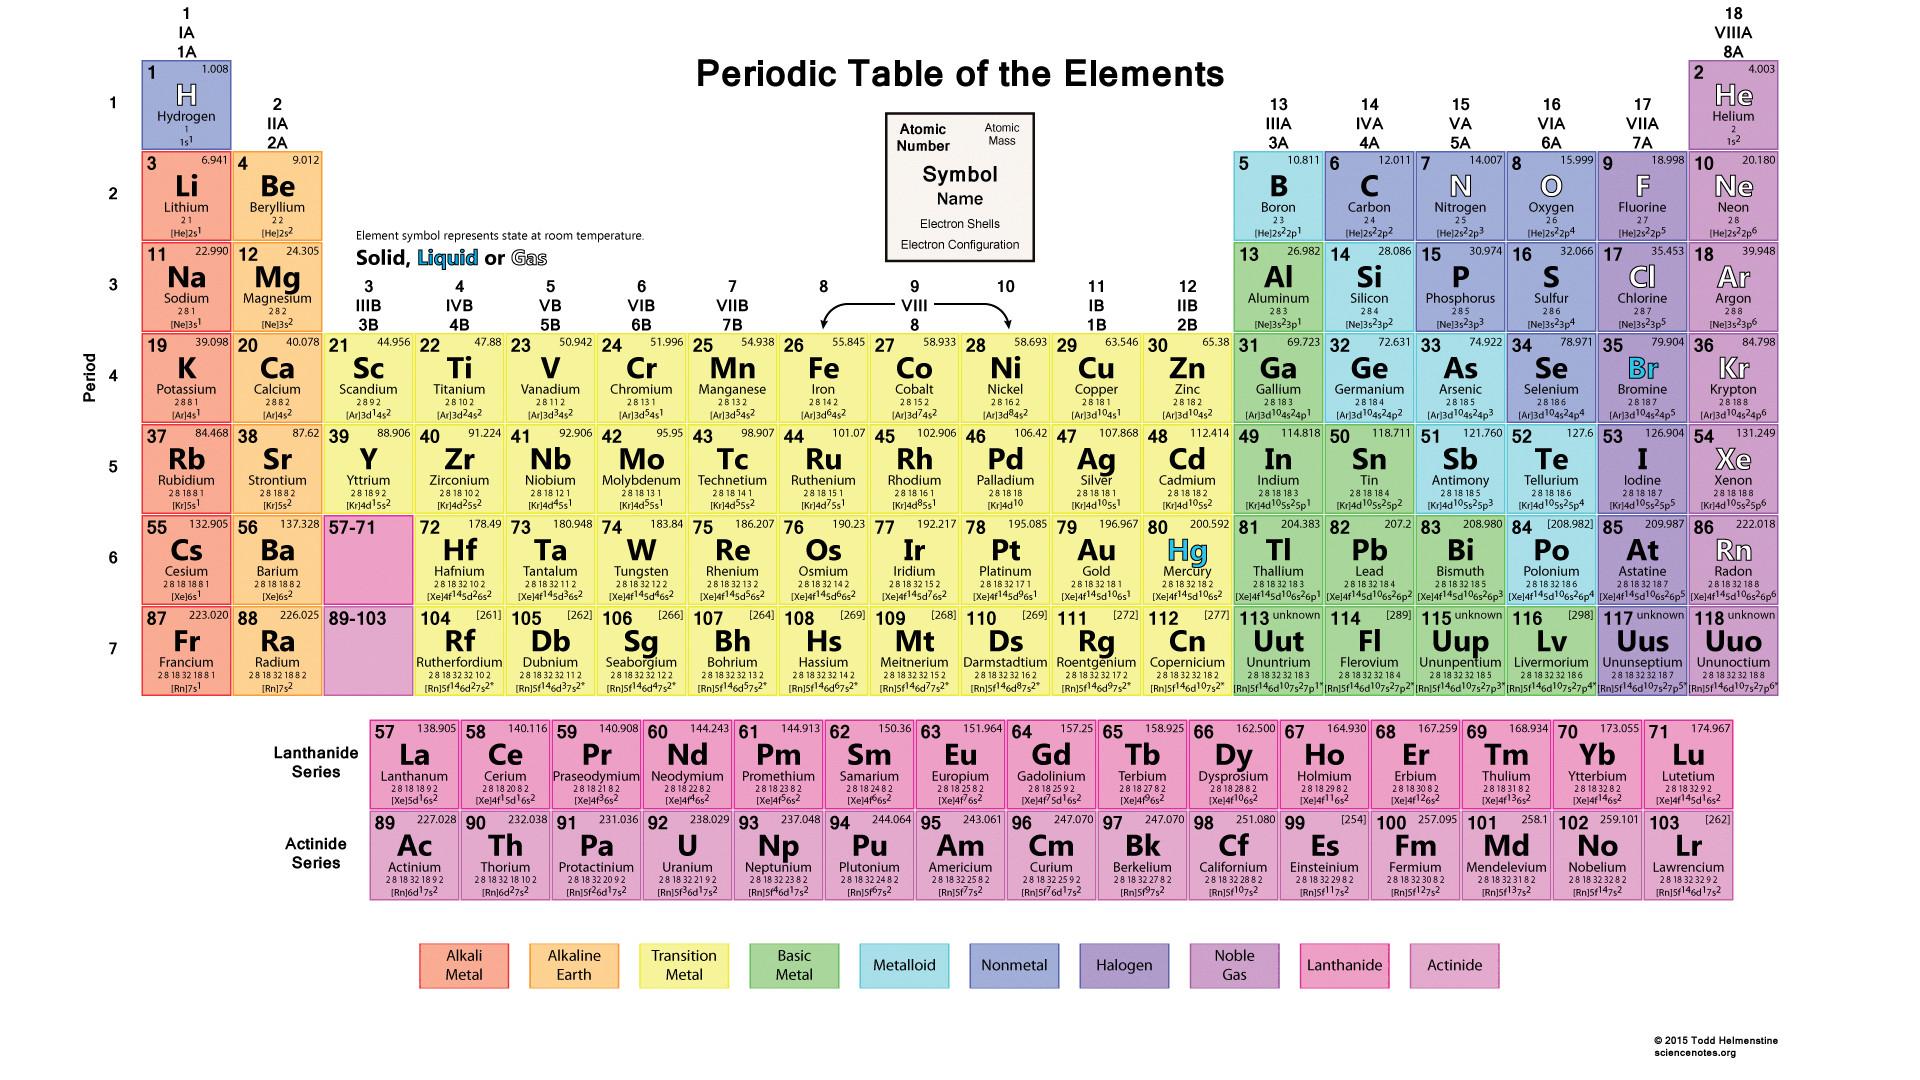 Unp periodic table gallery periodic table images periodic table neptunium images periodic table images periodic table wallpaper 80 images 1920x1080 periodic table wallpaper gamestrikefo Images